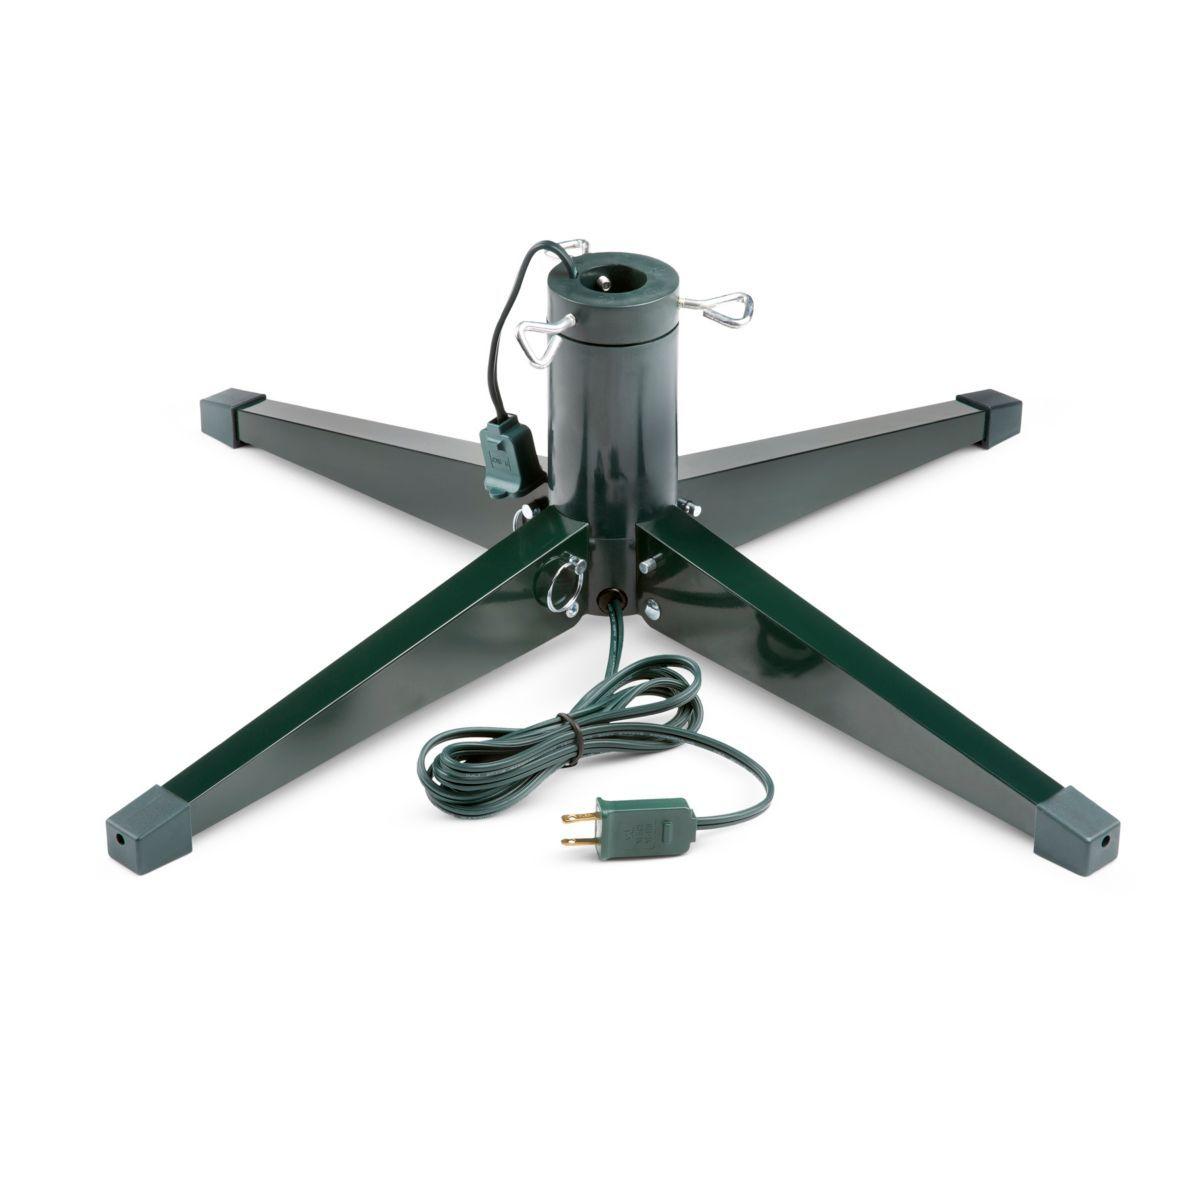 Rotating Christmas Tree Stand.Heavy Duty Rotating Christmas Tree Stand Nbi